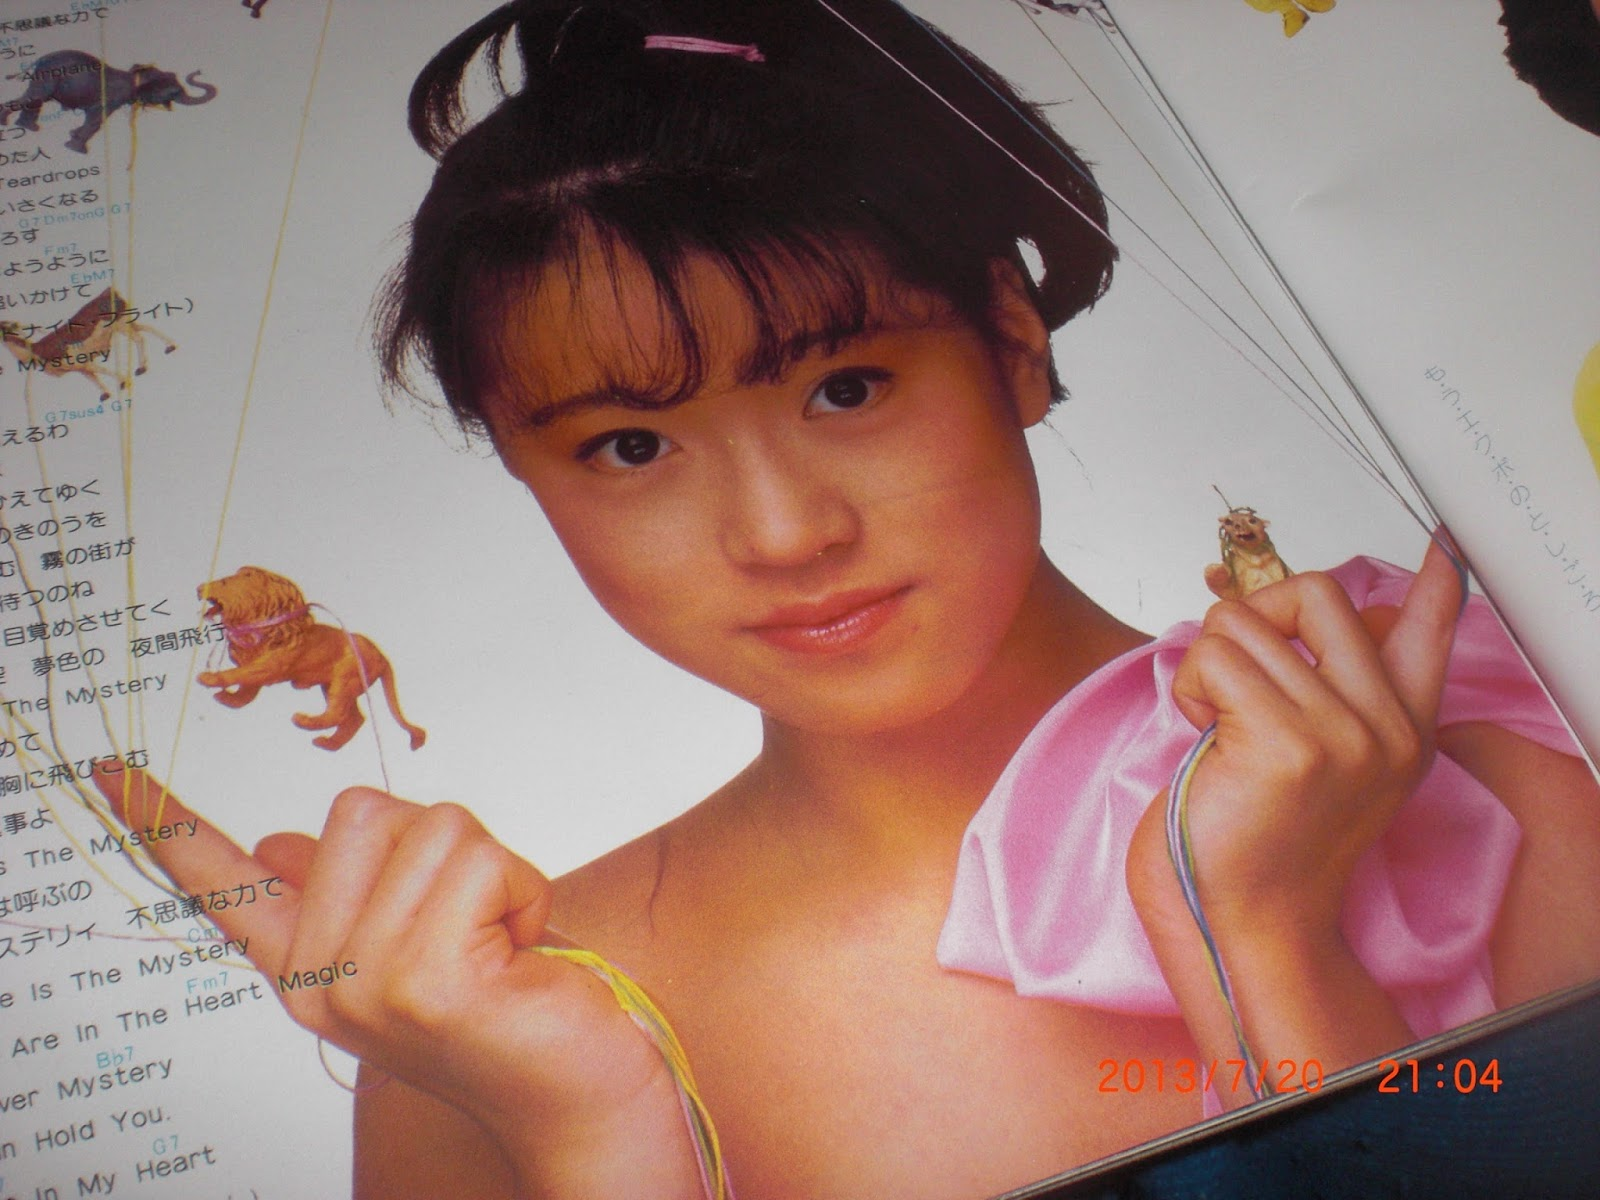 Mariko itsuki beautiful japanese nurse - 3 part 4